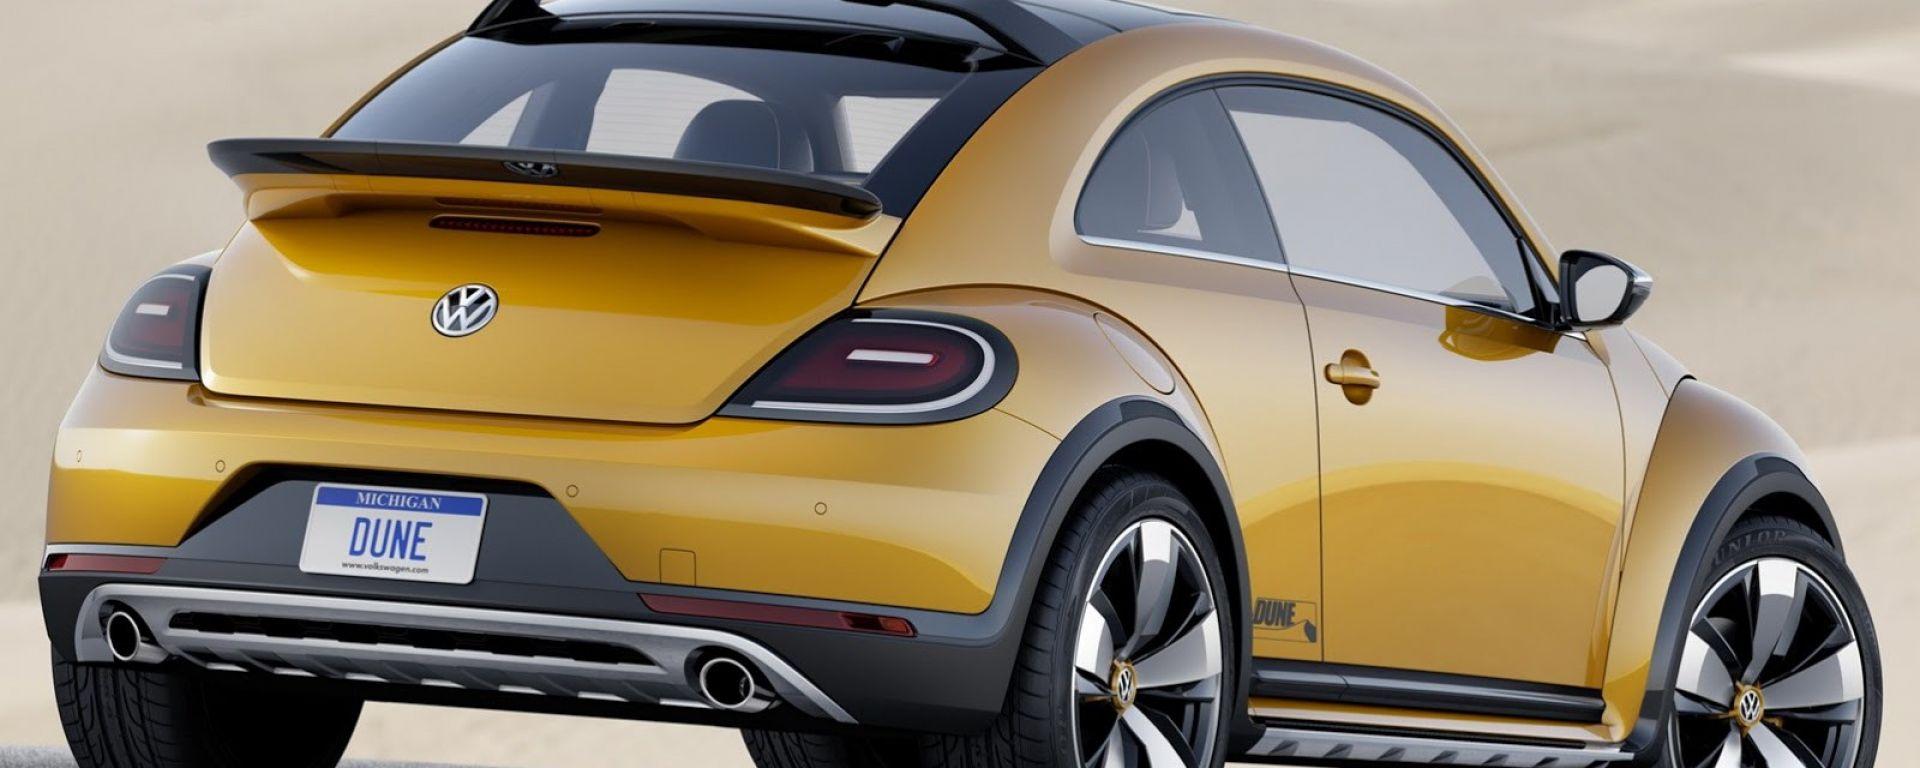 Volkswagen Beetle Dune: tutte le foto